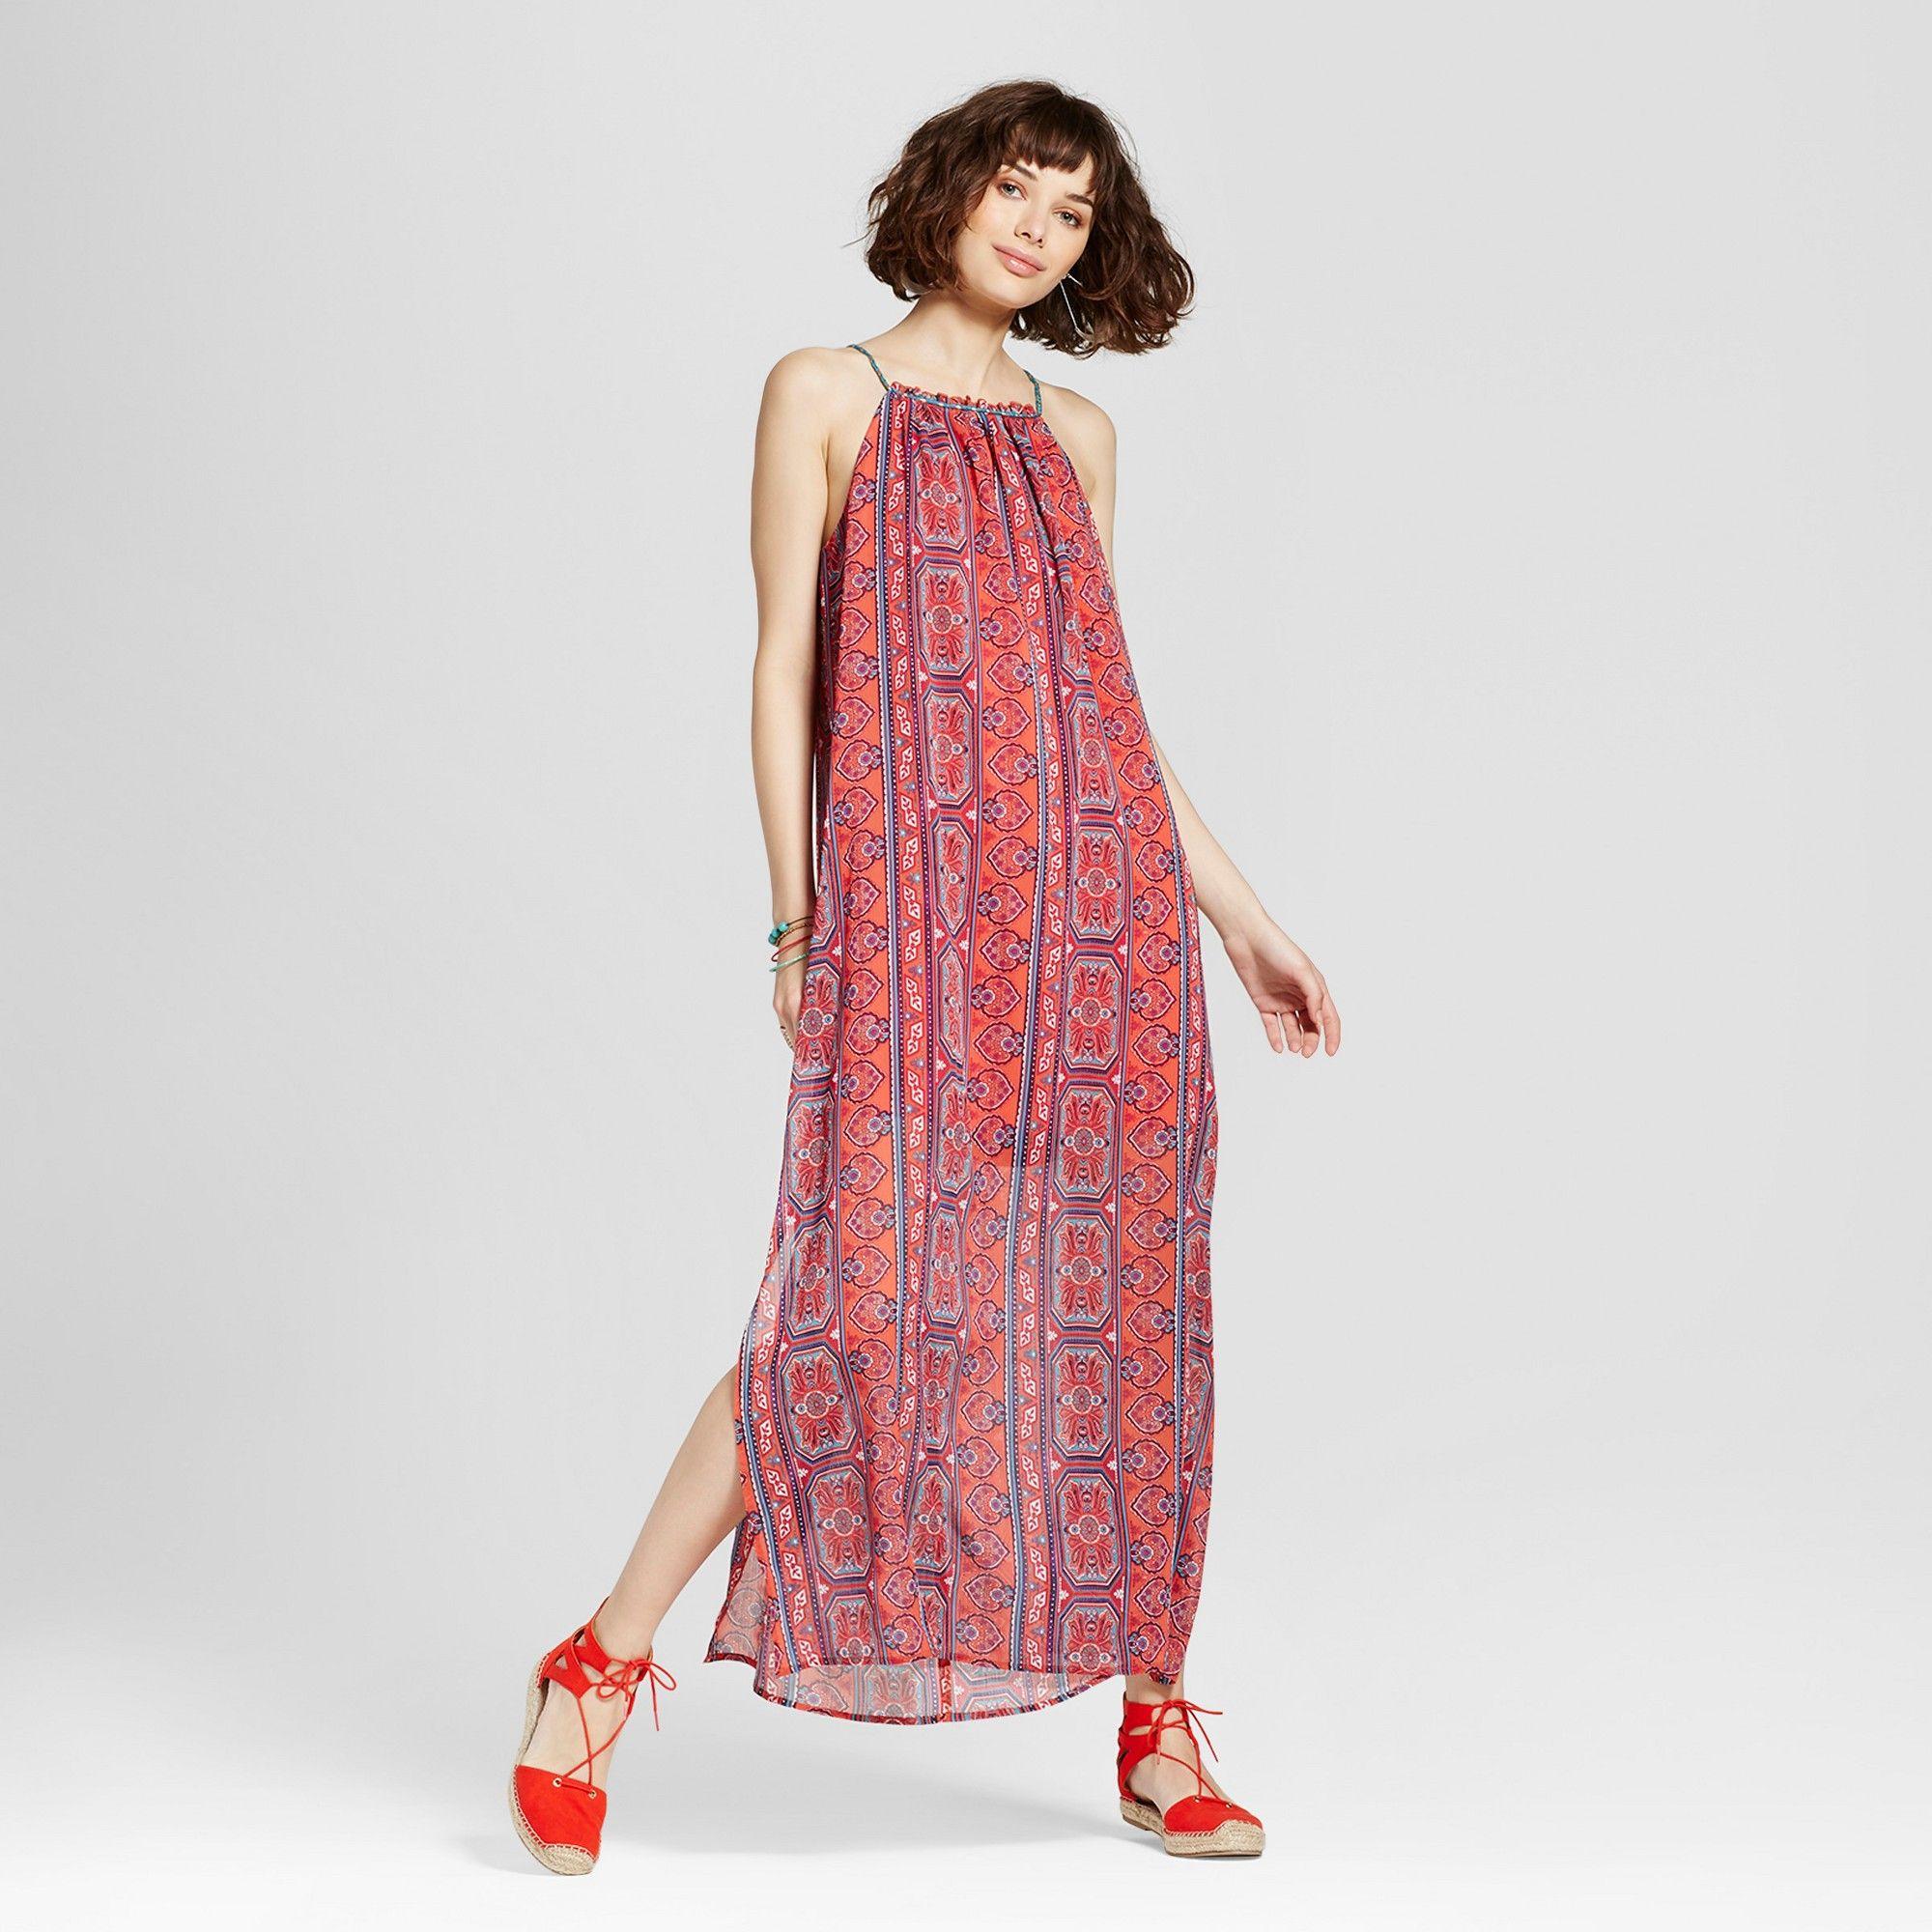 Womenus highneck printed maxi dress xhilaration juniorsu pink s